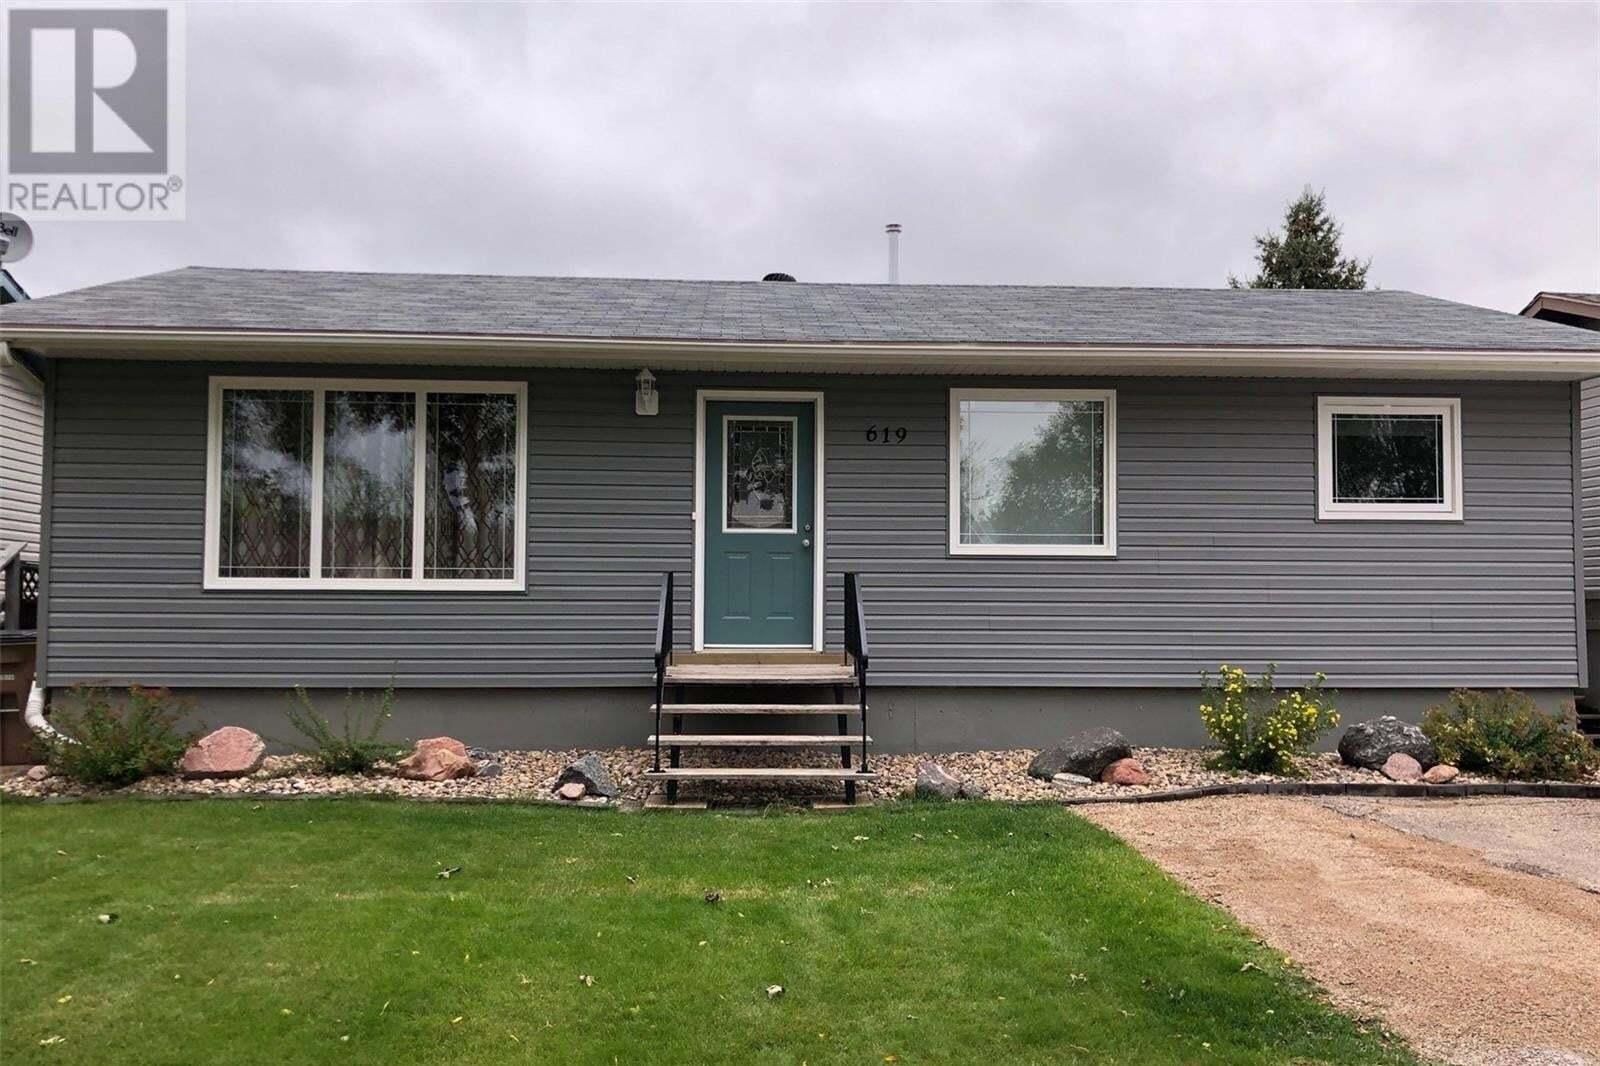 House for sale at 619 97th Ave Tisdale Saskatchewan - MLS: SK809799